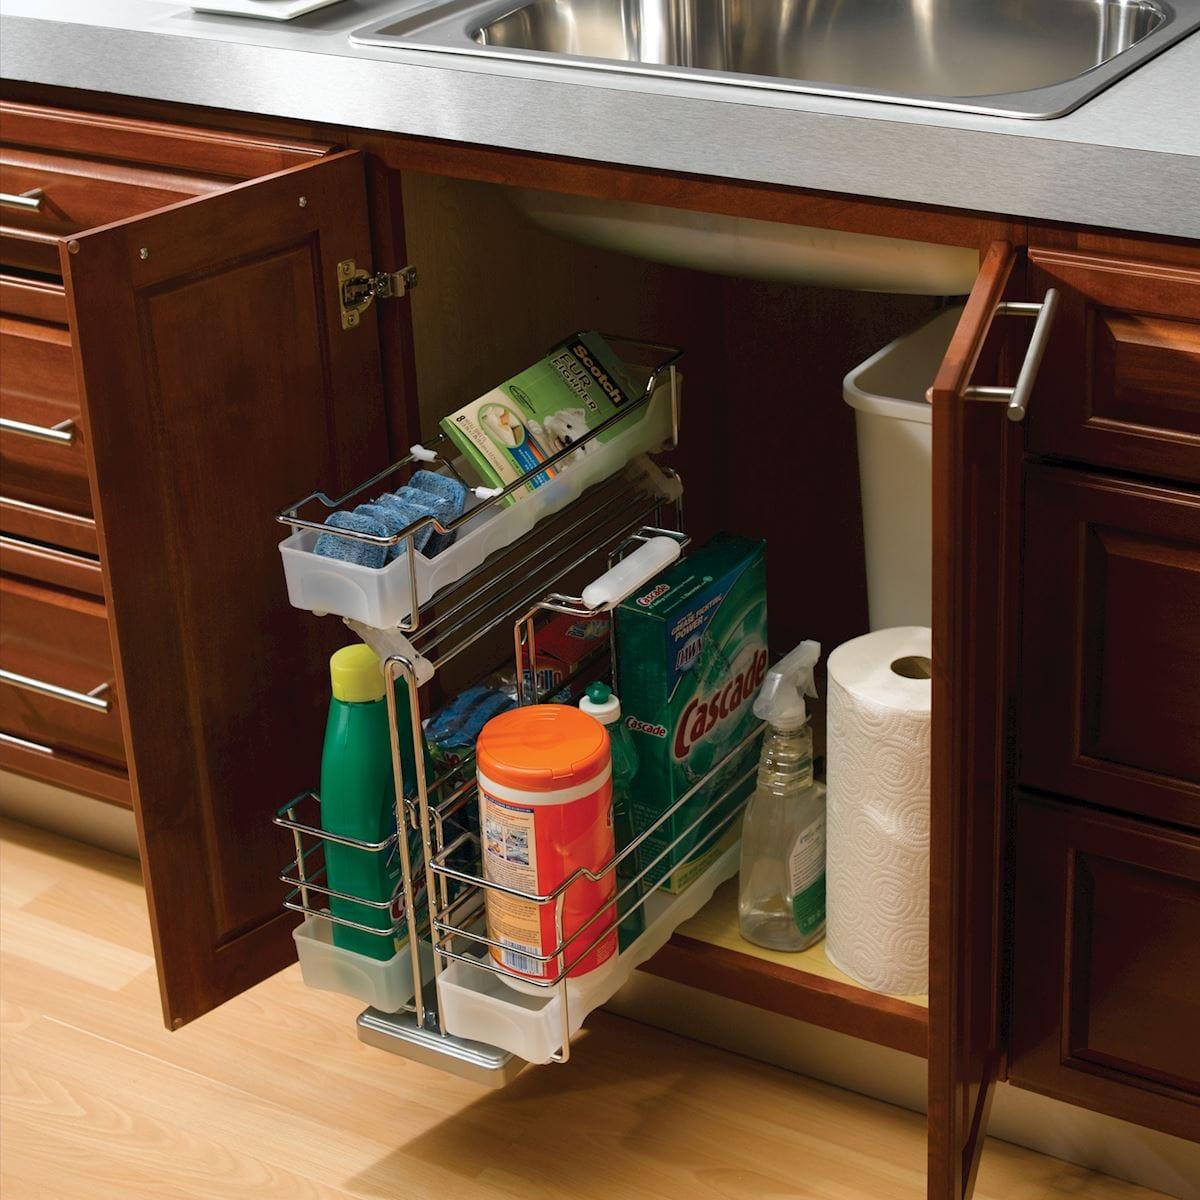 Undersink Caddy - Accessories - Bertch Cabinet Manufacturing on kitchen cupboard accessories, kitchen cabinets parts accessories, under kitchen storage,